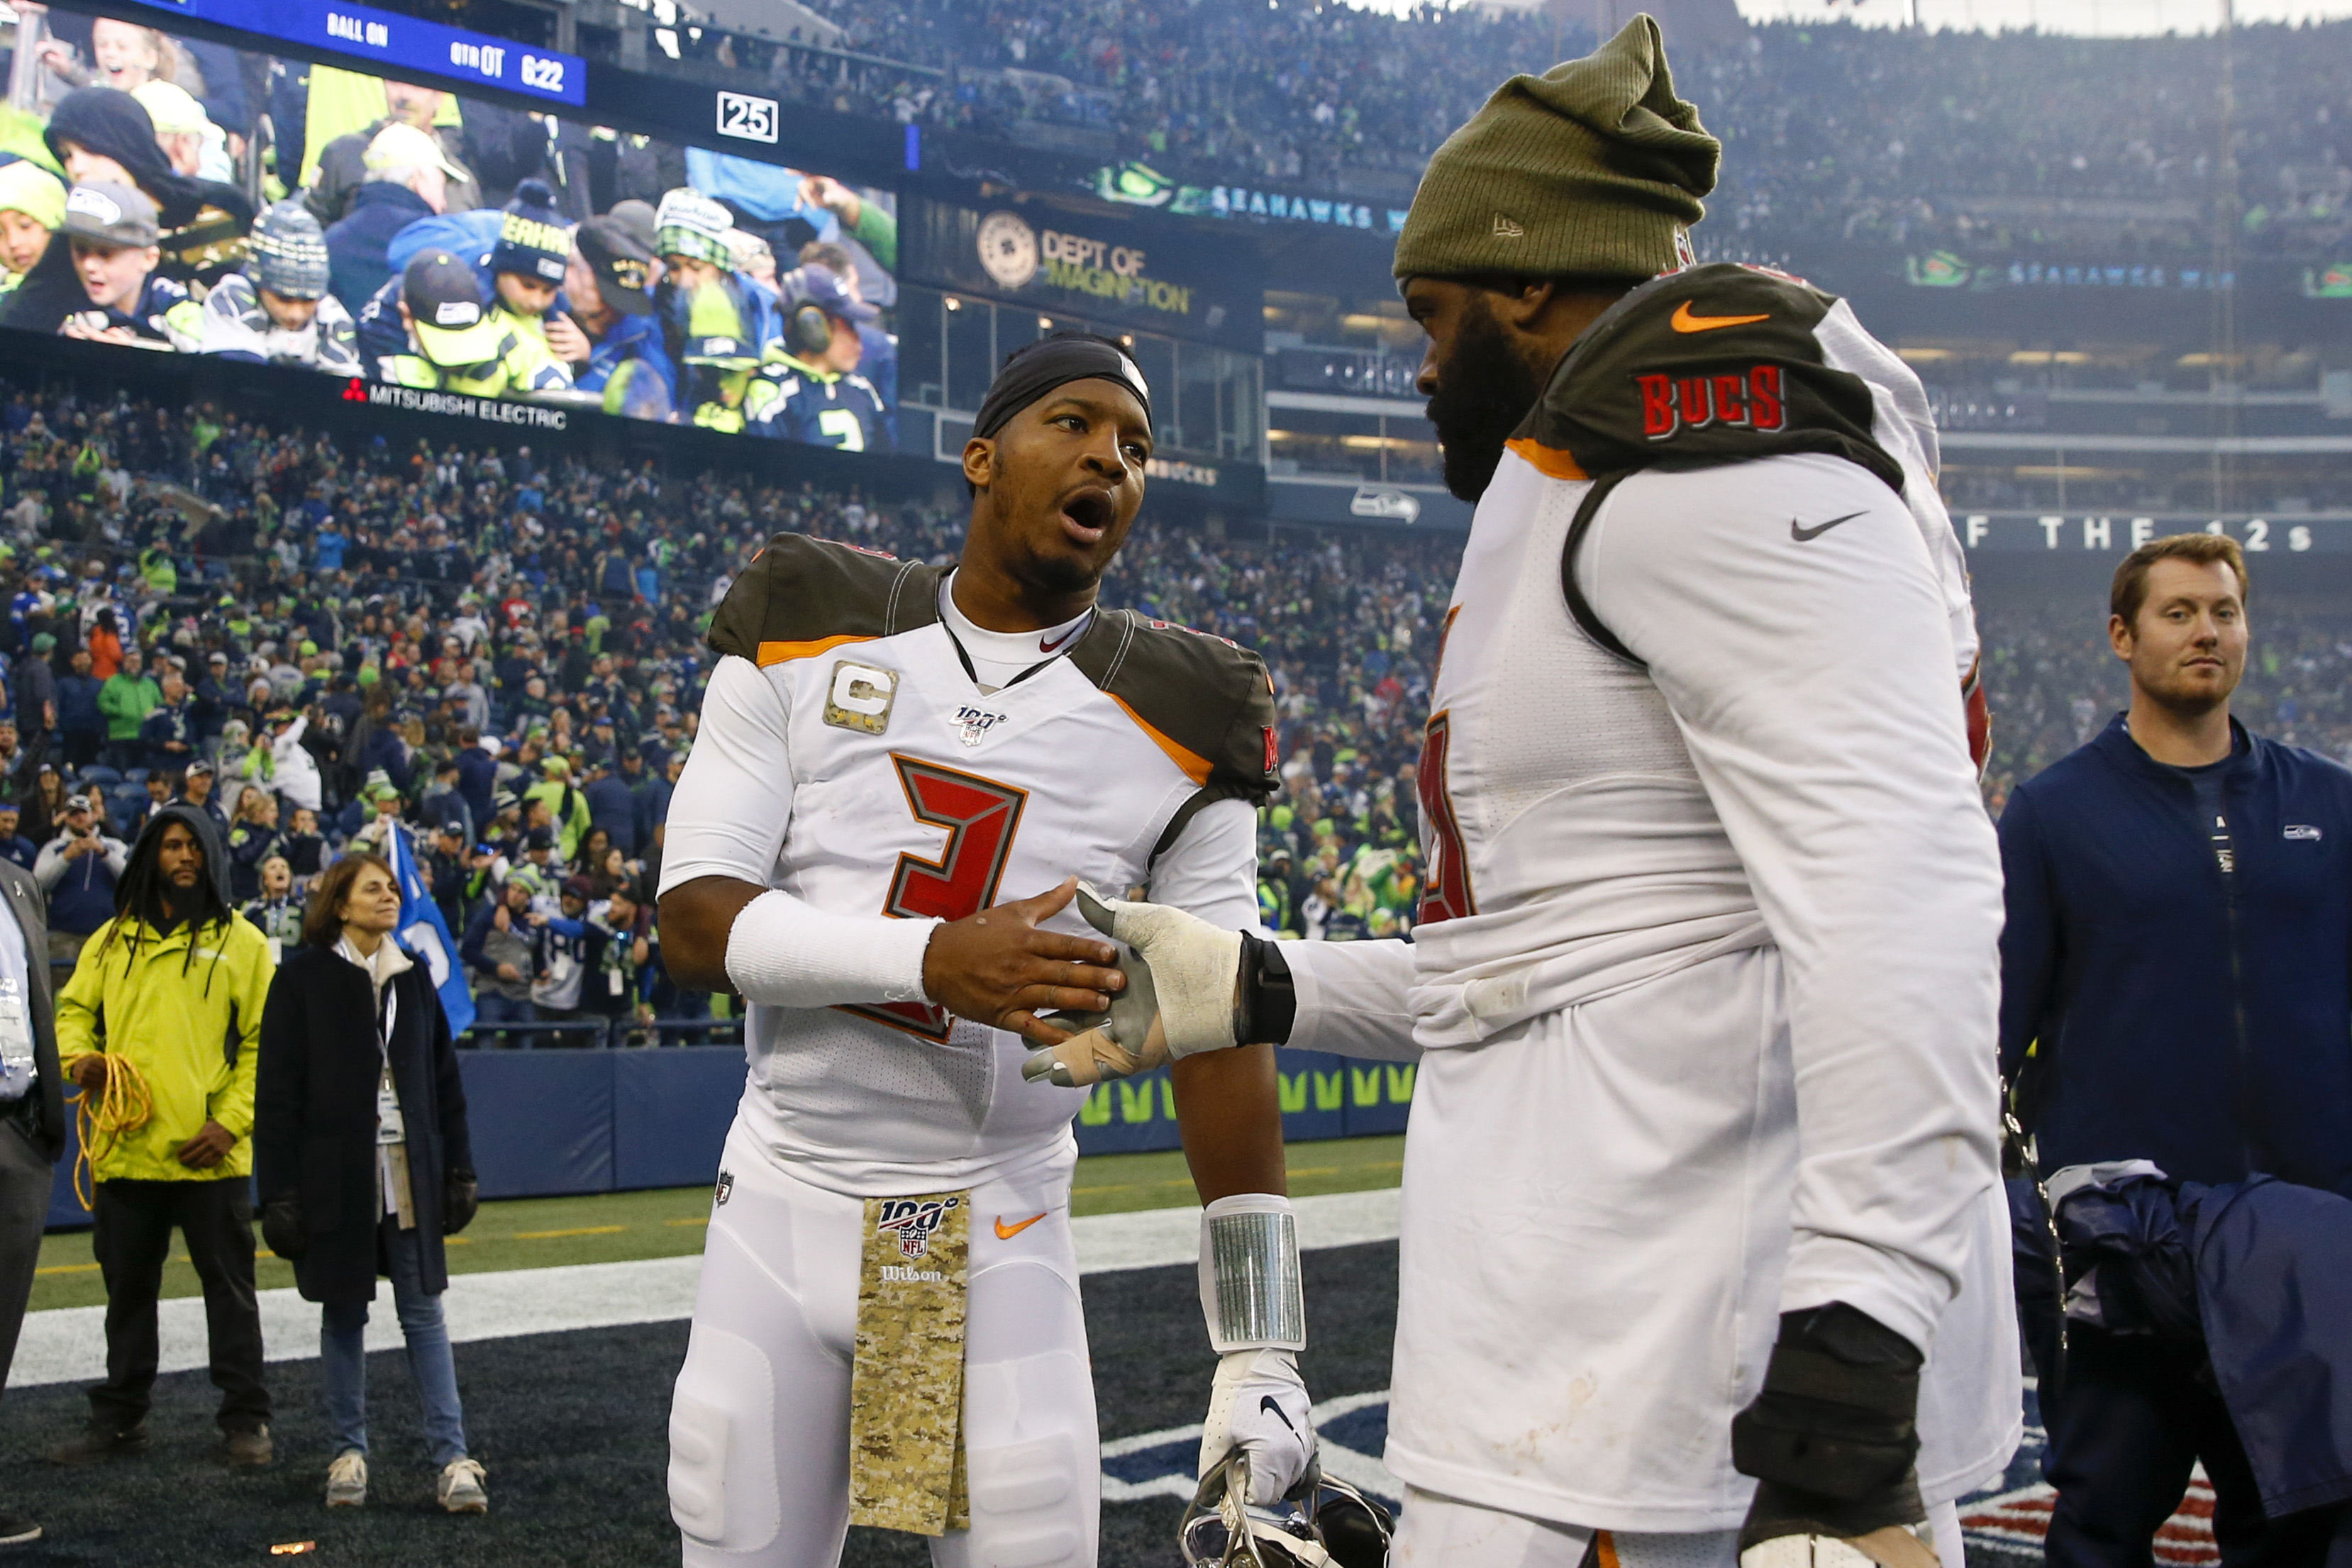 Bucs Injury Report: Key Starters in Doubt for Week 15